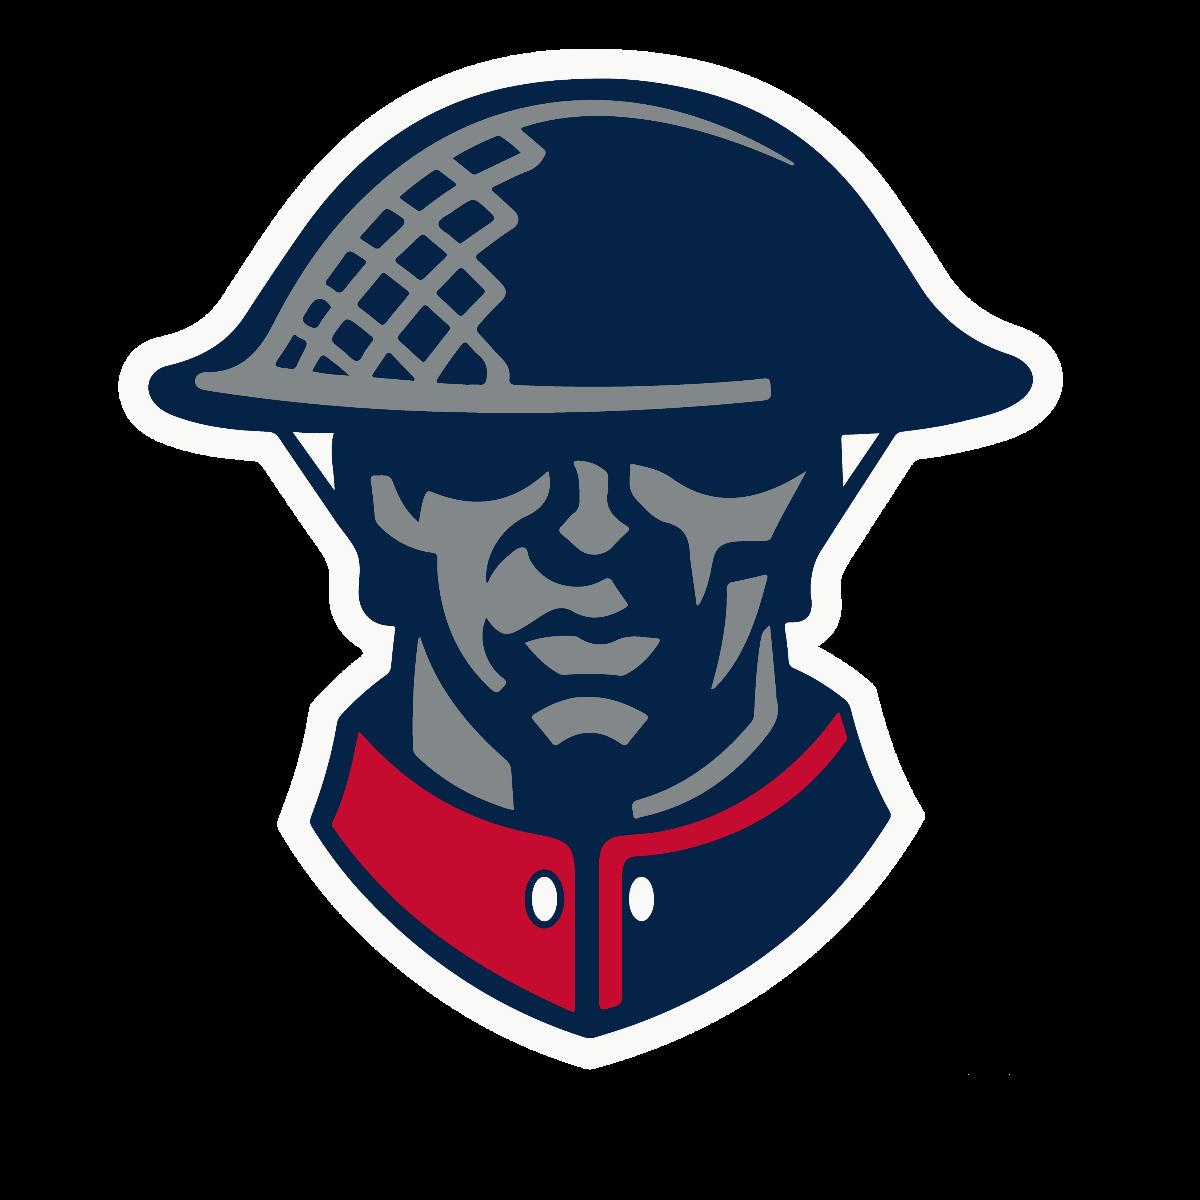 Rangers_helmet_logo_original.png